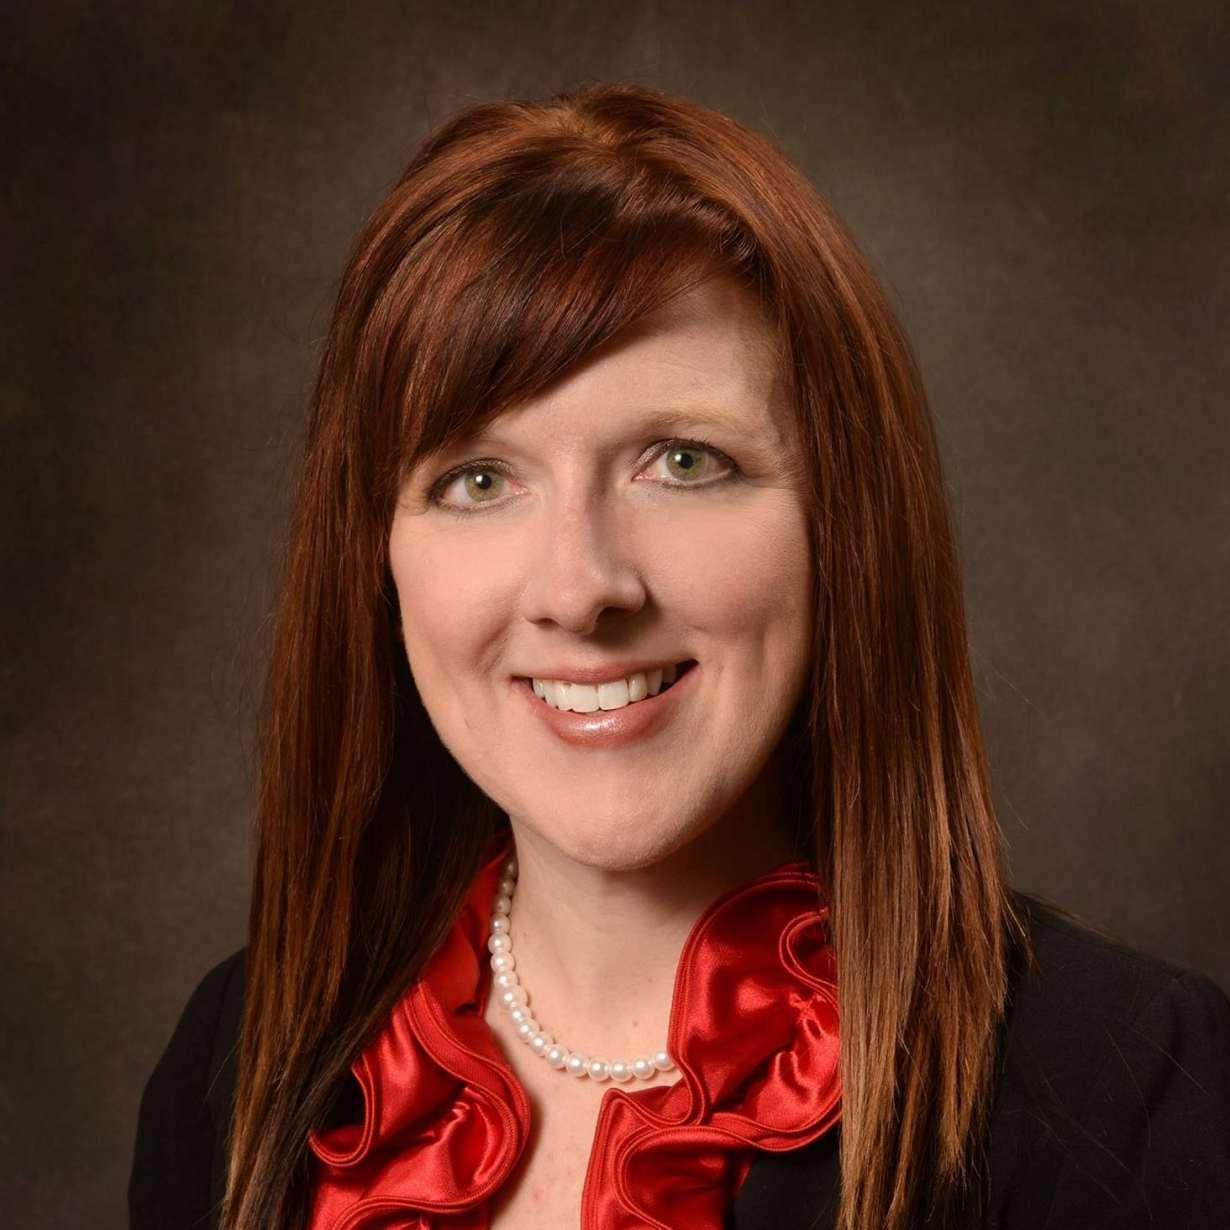 SBJW Insurance's Sara Bruns